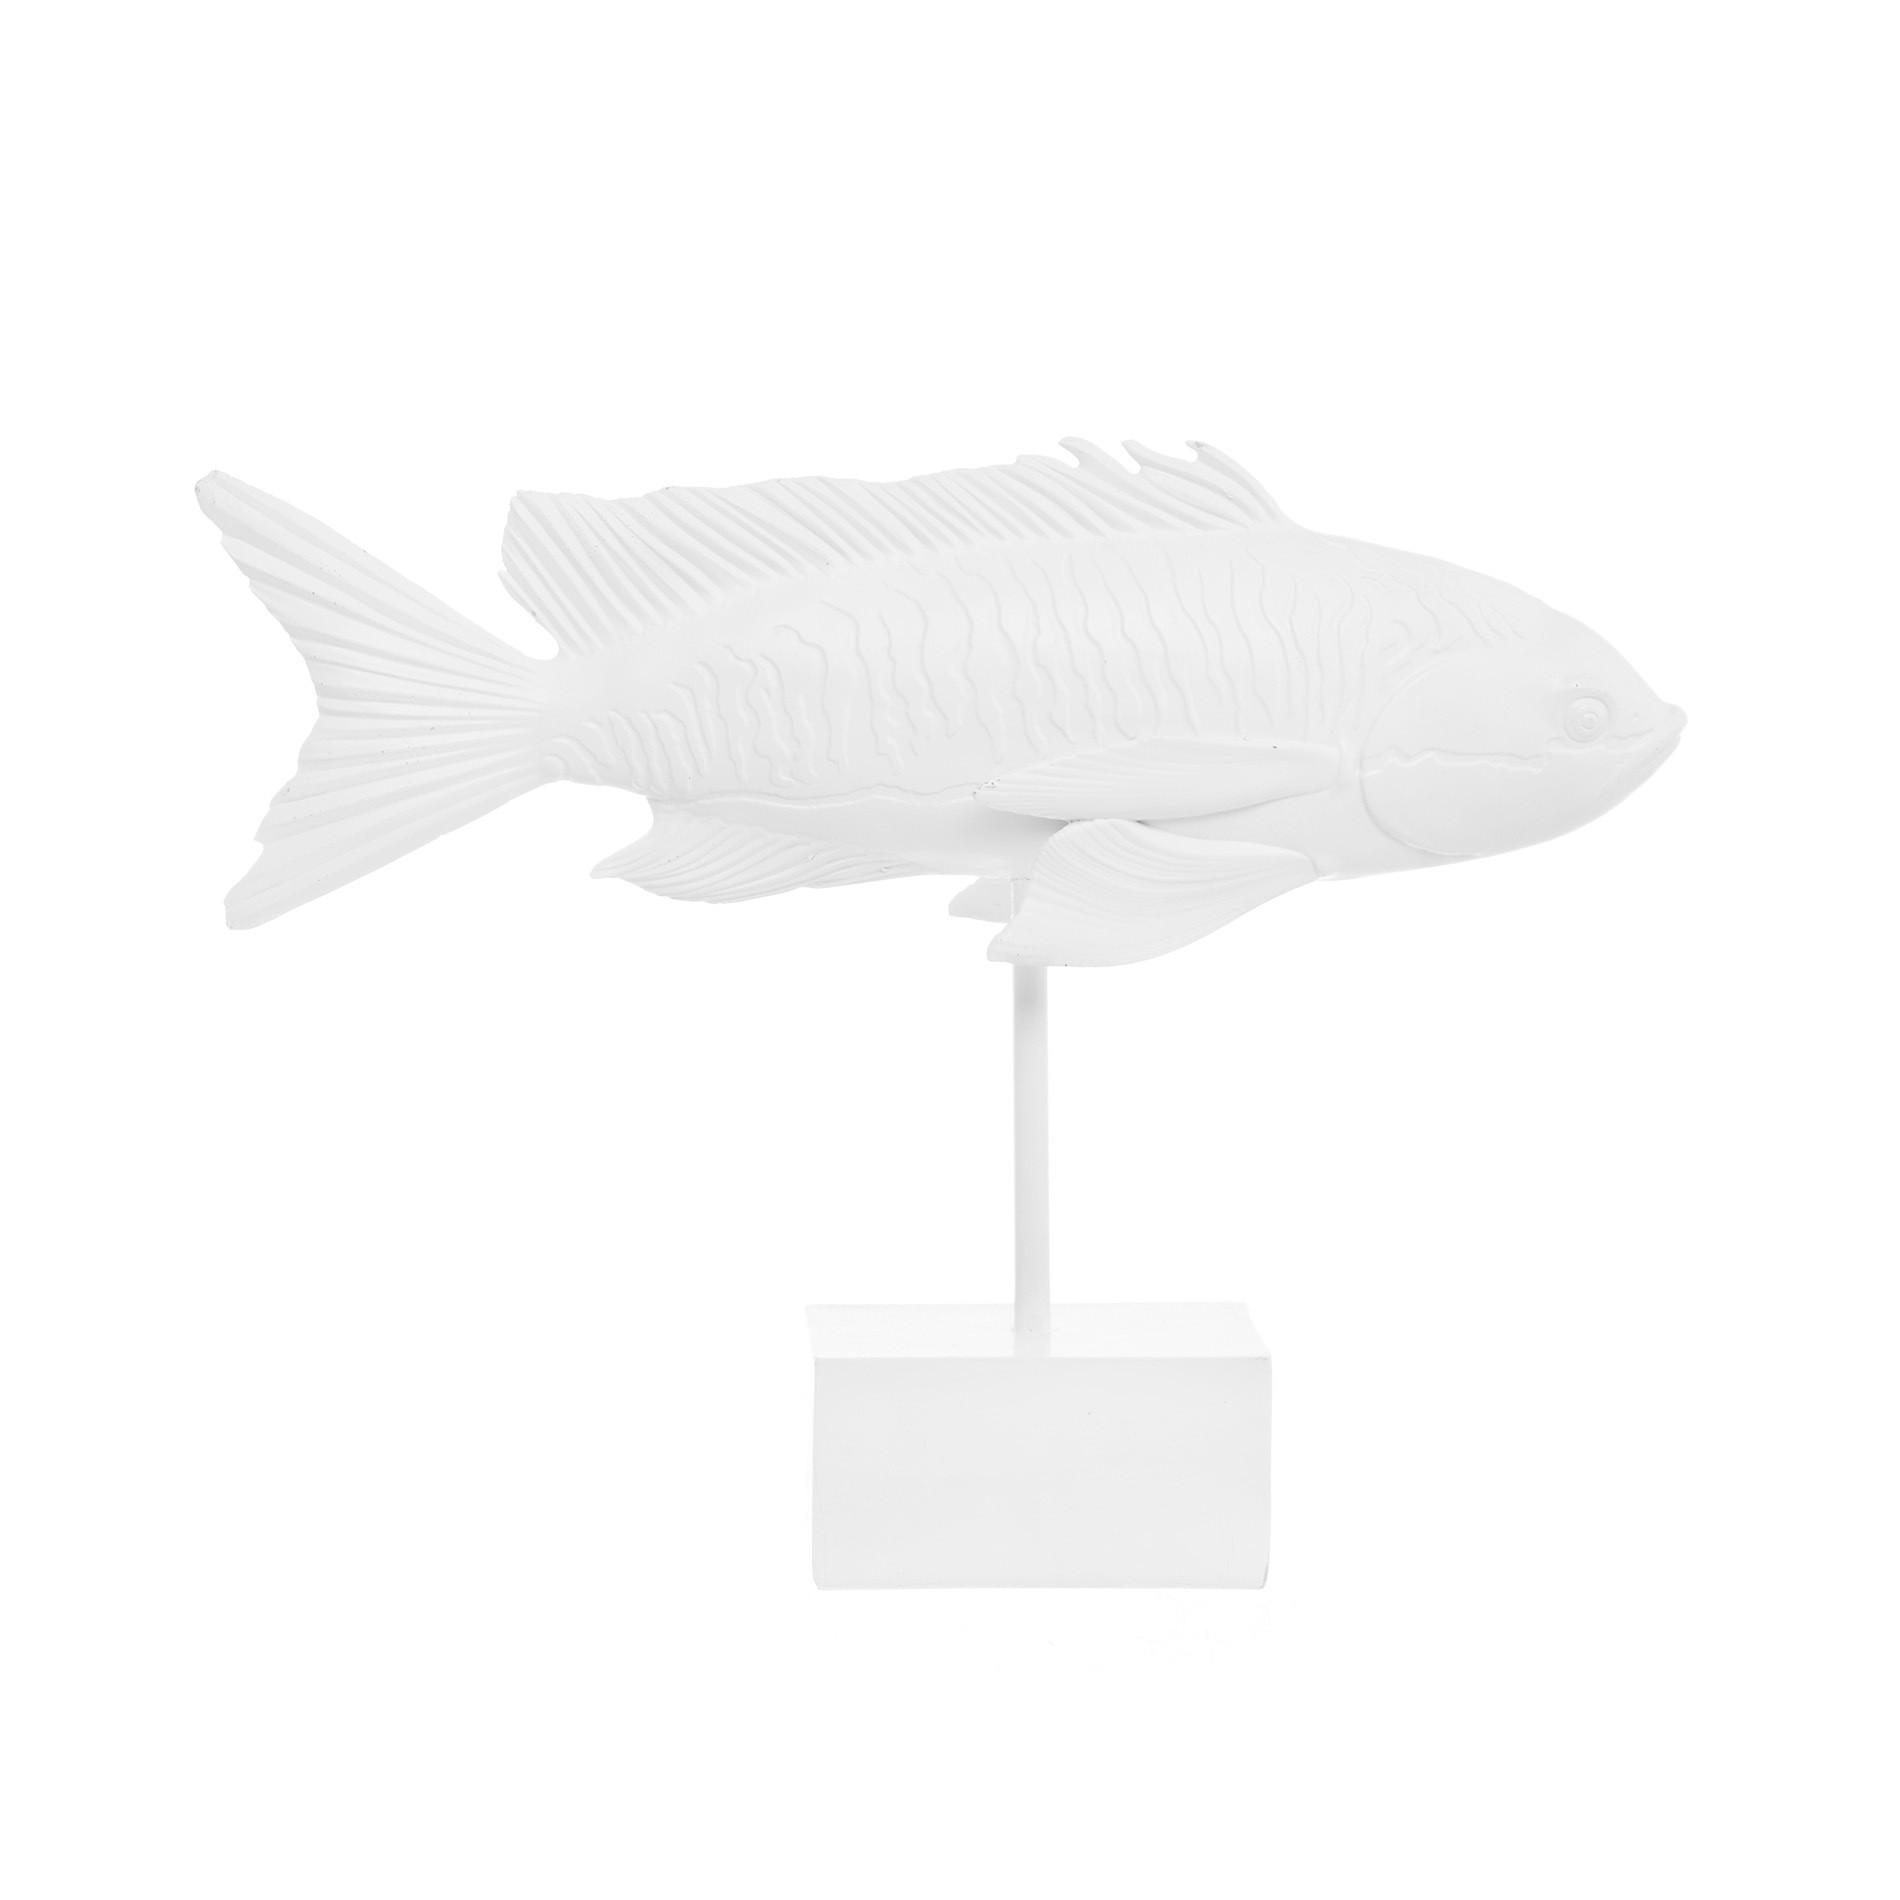 Pesce su stand rifinito a mano, Bianco, large image number 0